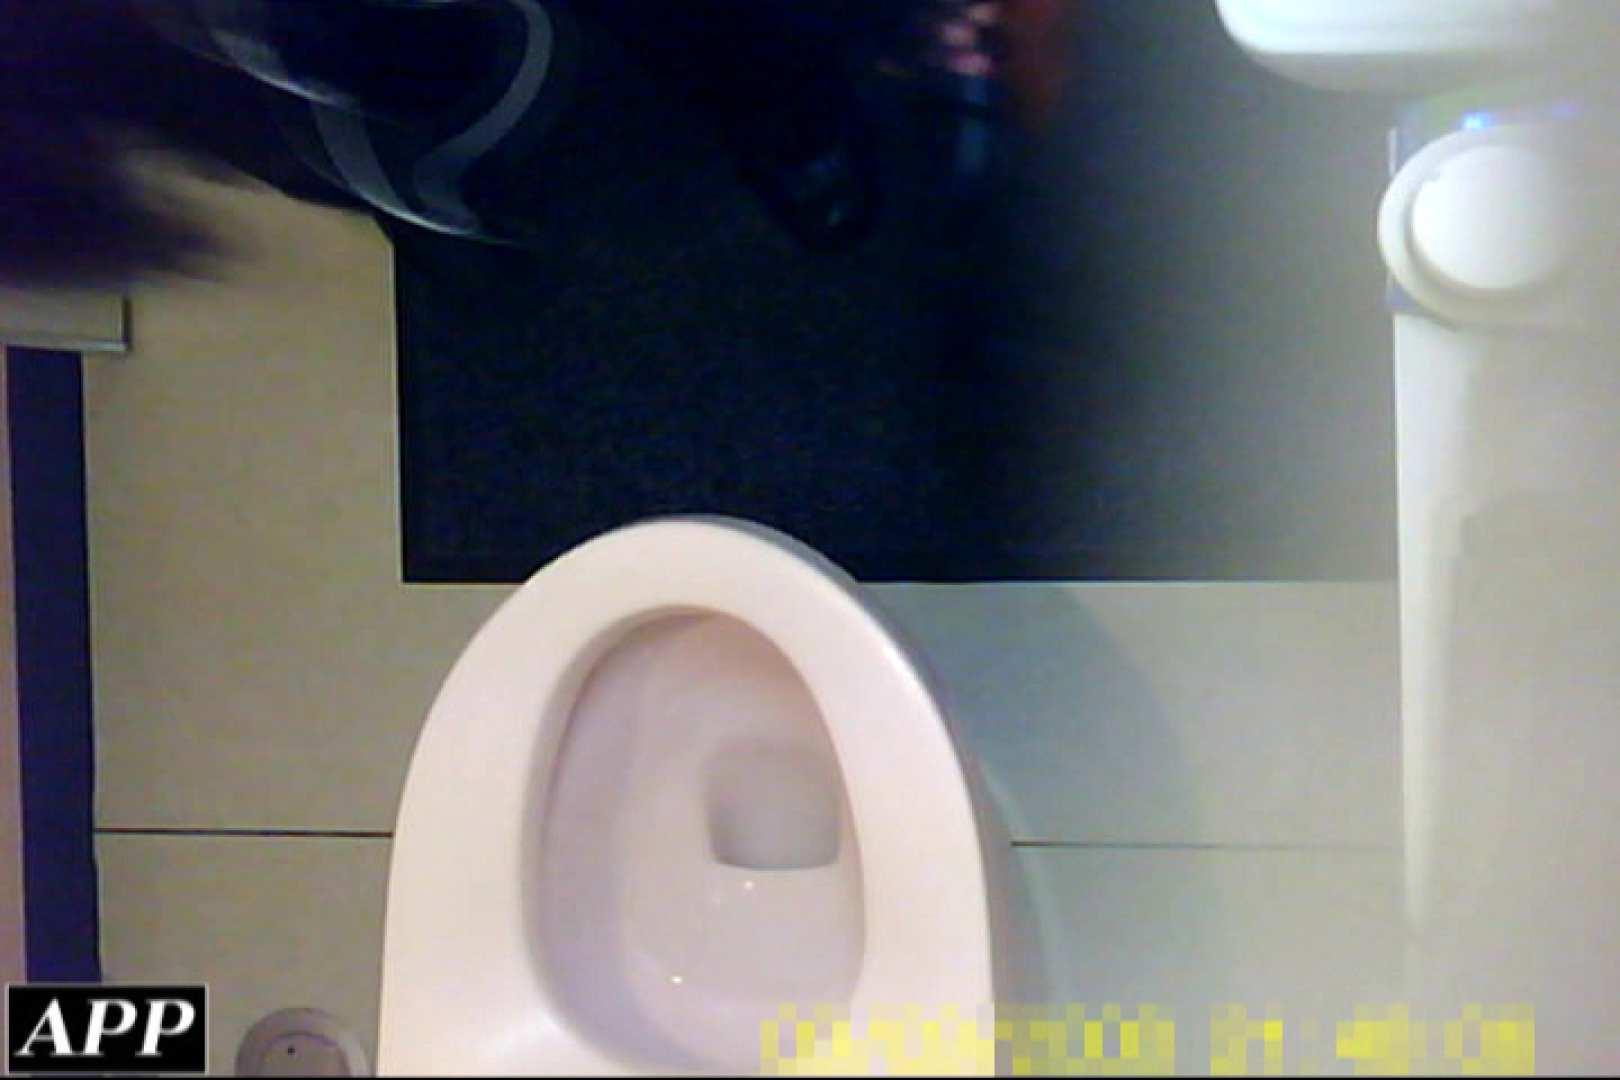 3視点洗面所 vol.09 盗撮で悶絶 セックス無修正動画無料 106画像 39